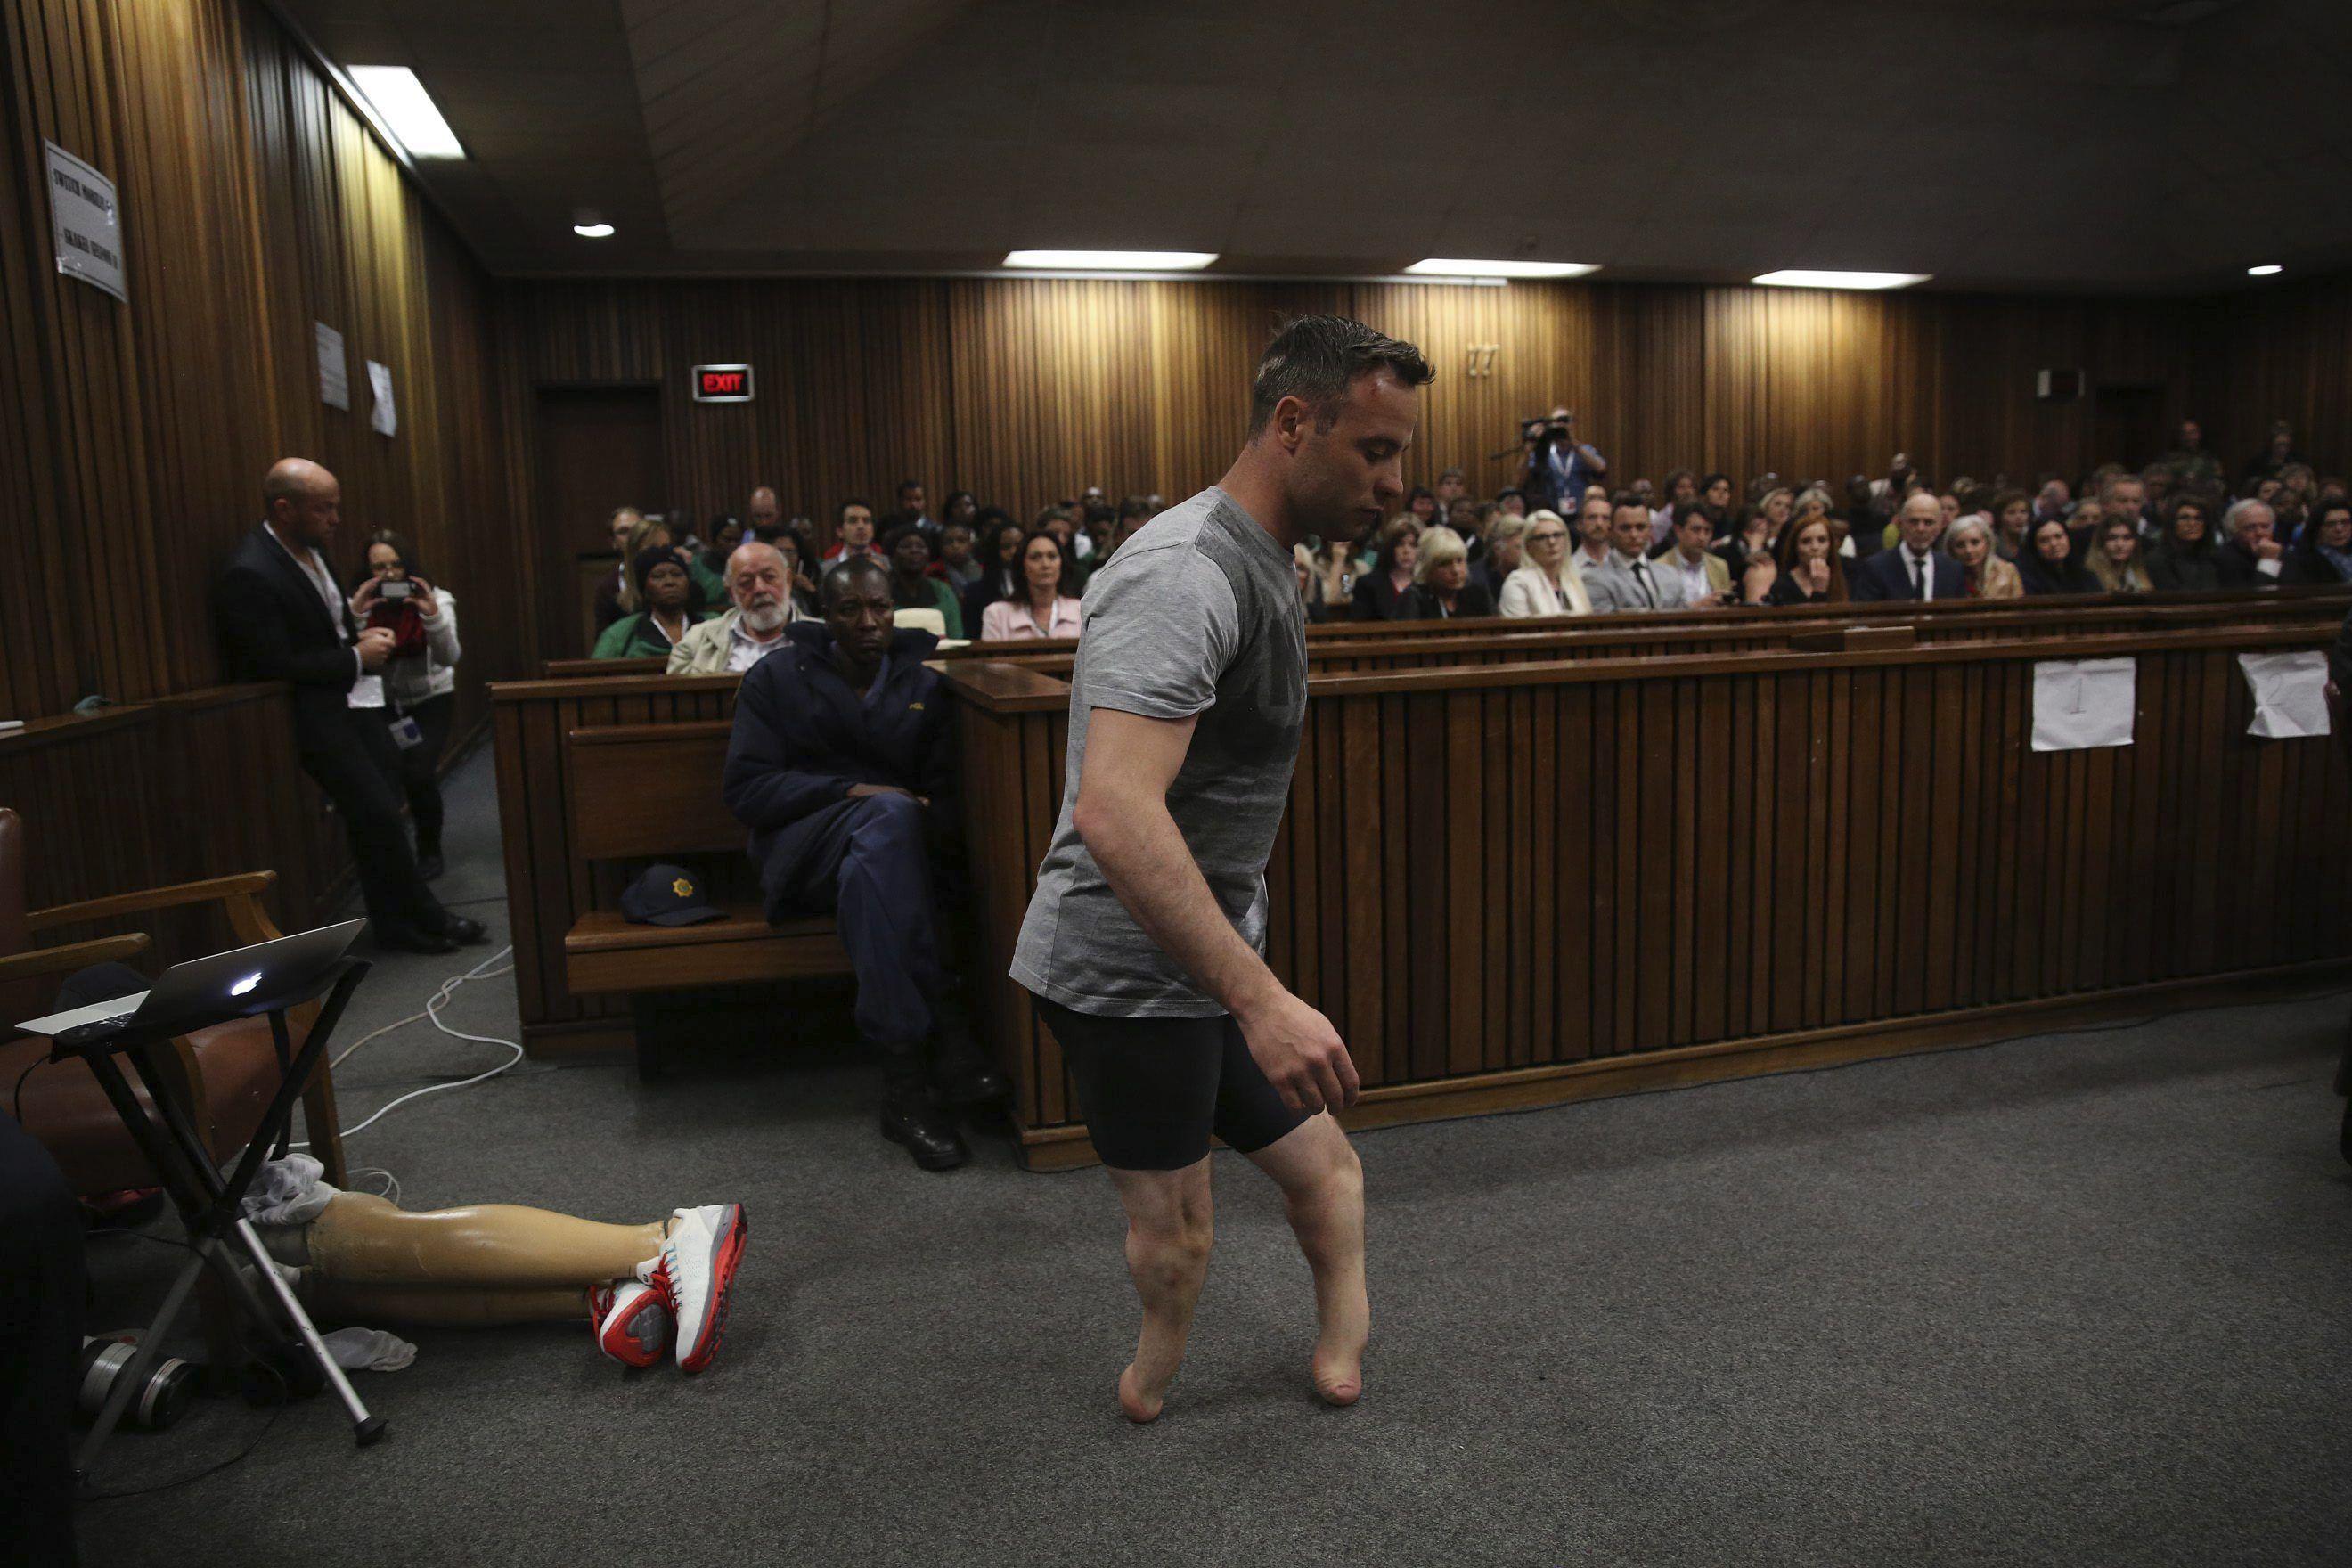 Pistorius se sacó las prótesis en medio del juicio por la muerte de su novia